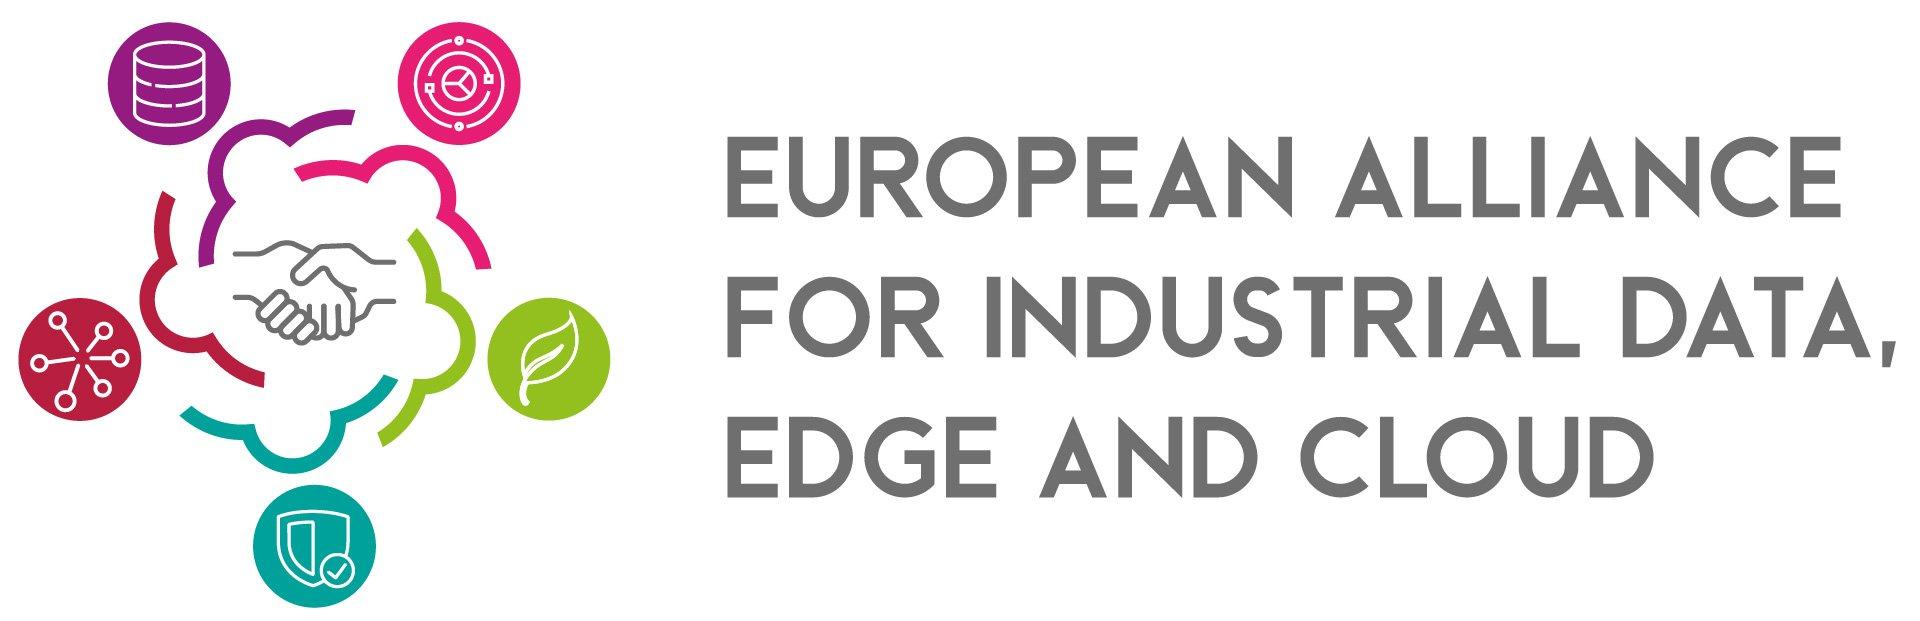 European Alliance for Industrial Data, Edge and Cloud